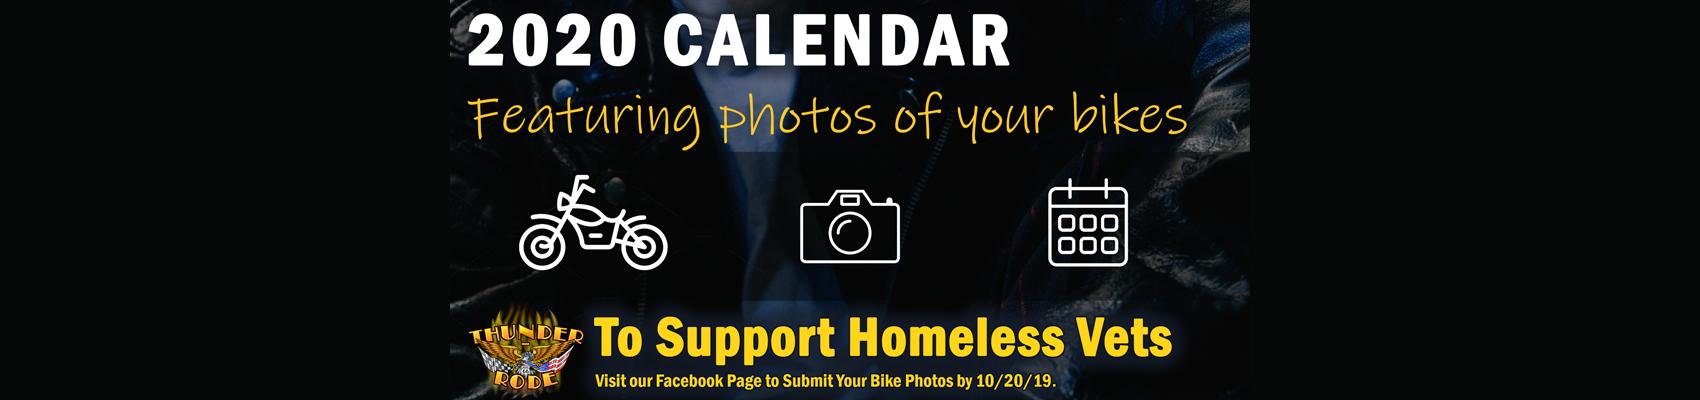 2020 Biker Calendar Supporting Homeless Veterans